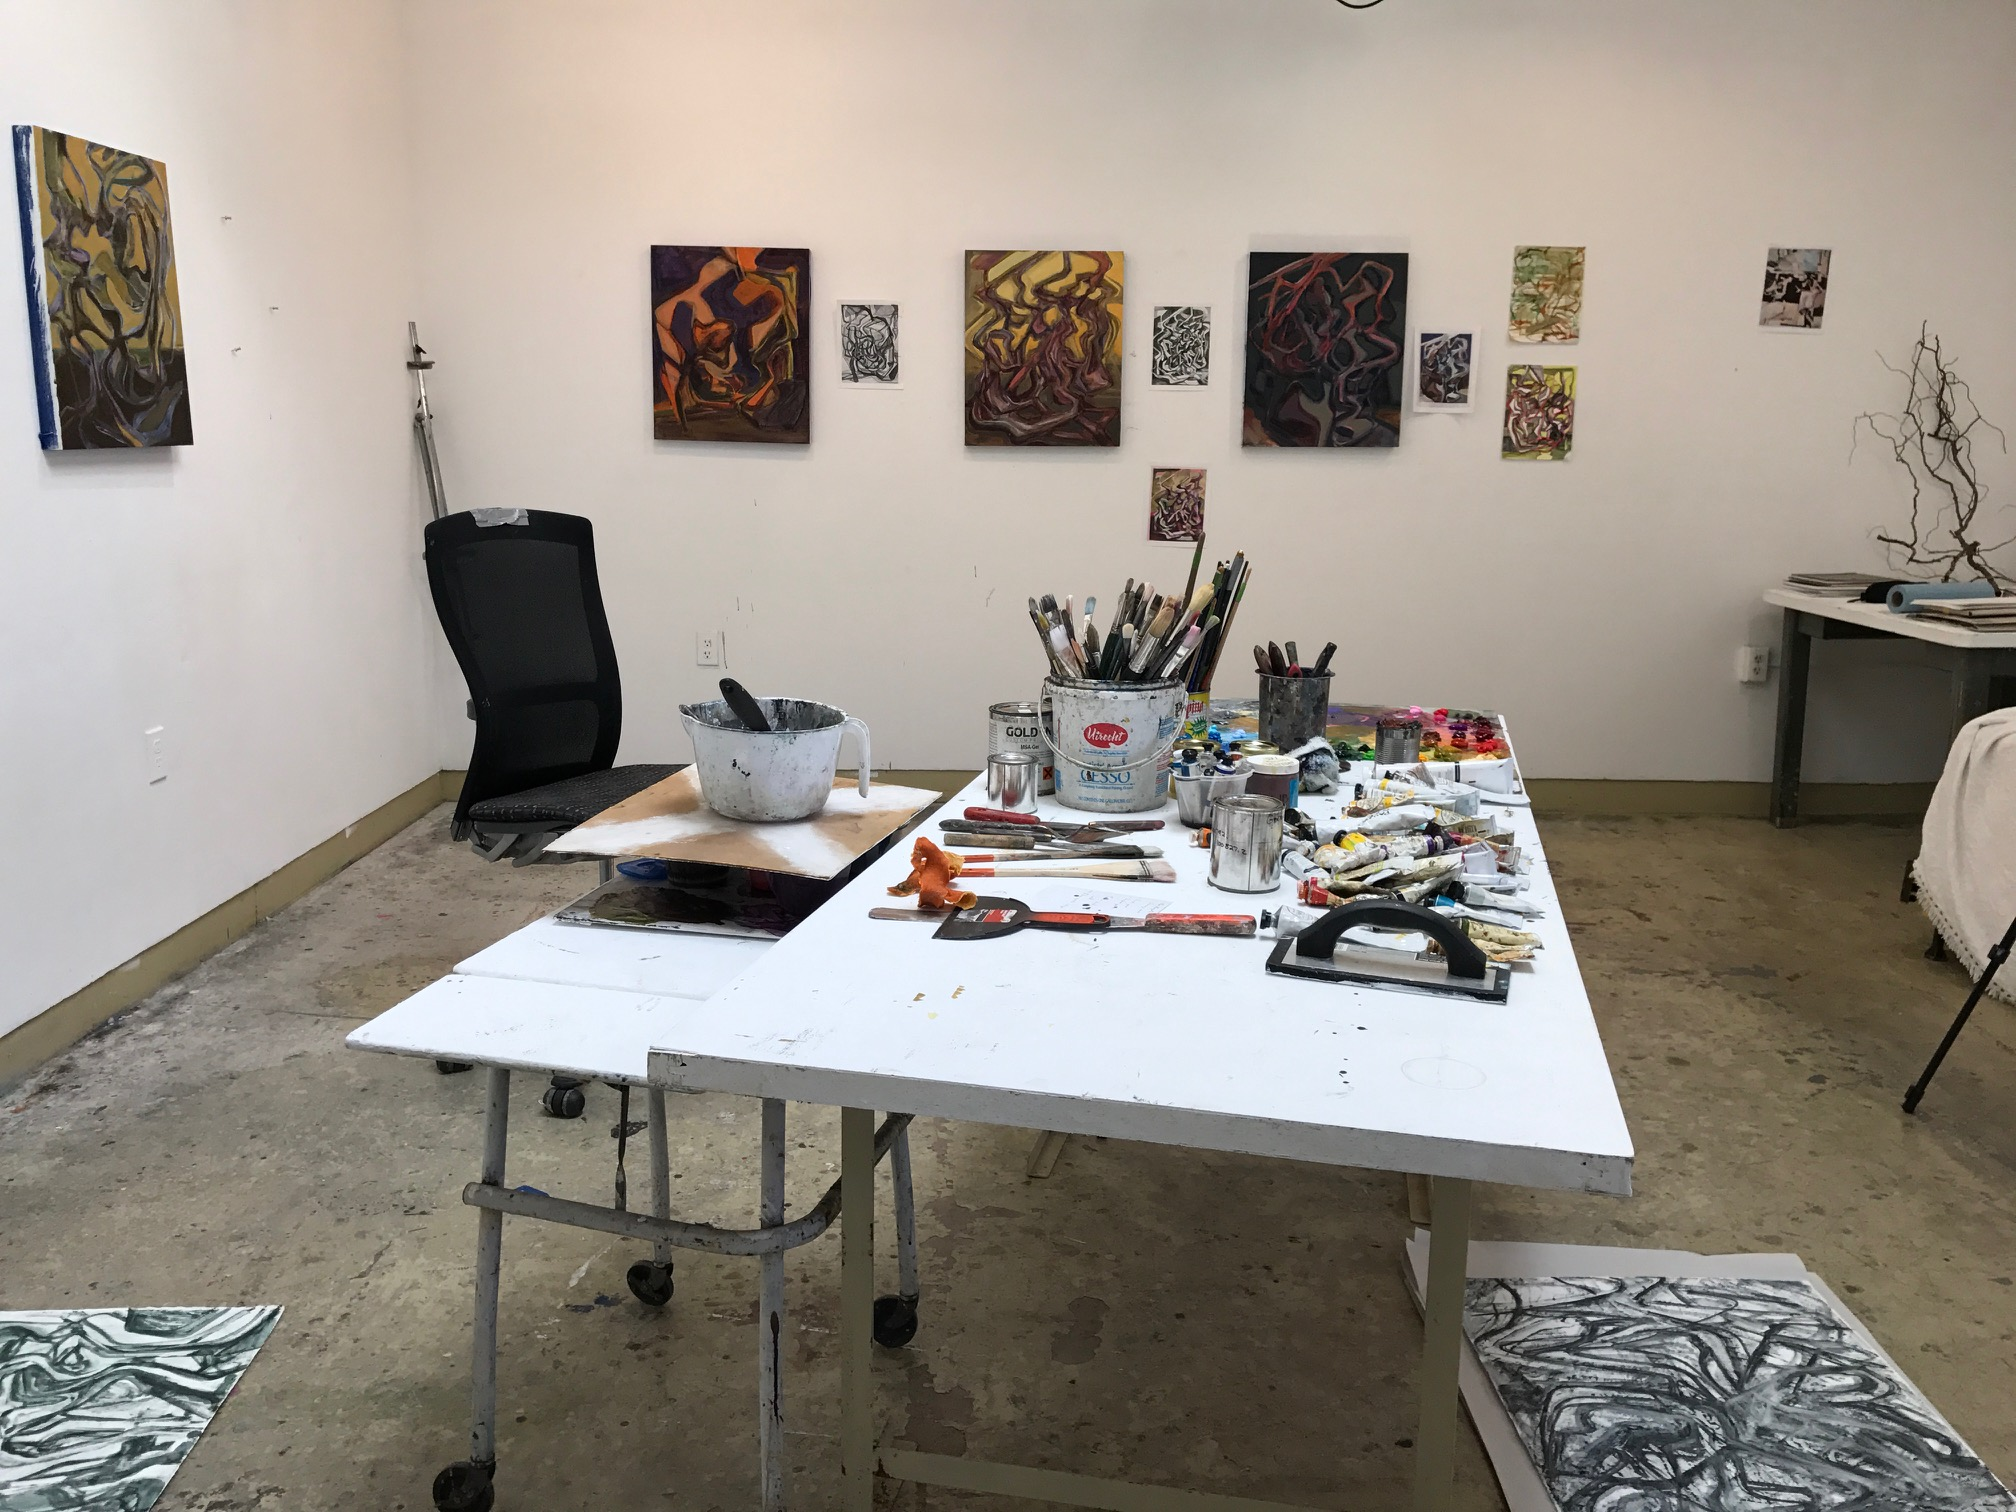 Some of Chris McEvoy's work displayed around his studio